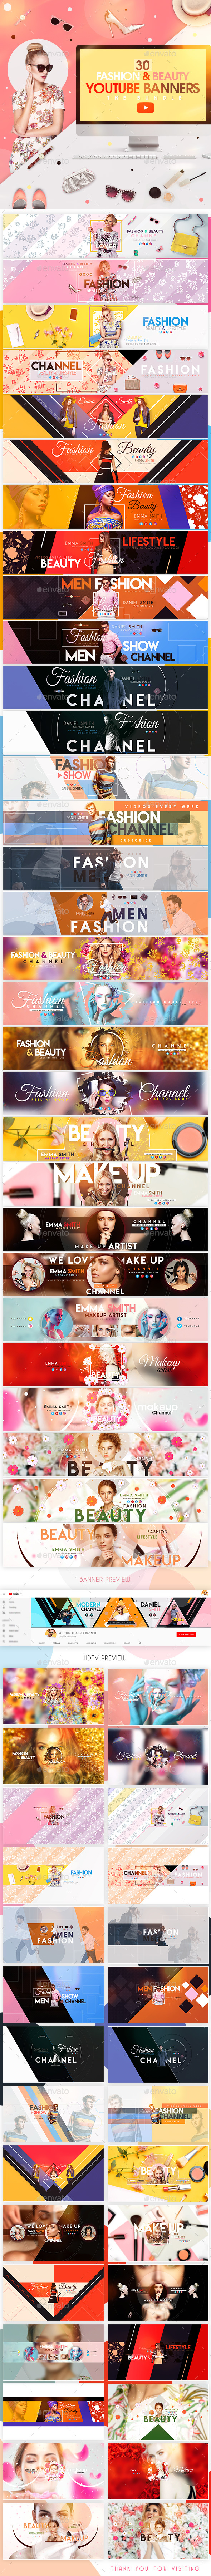 YouTube Bundle - 30 Creative Beauty & Fashion YouTube Banners - YouTube Social Media